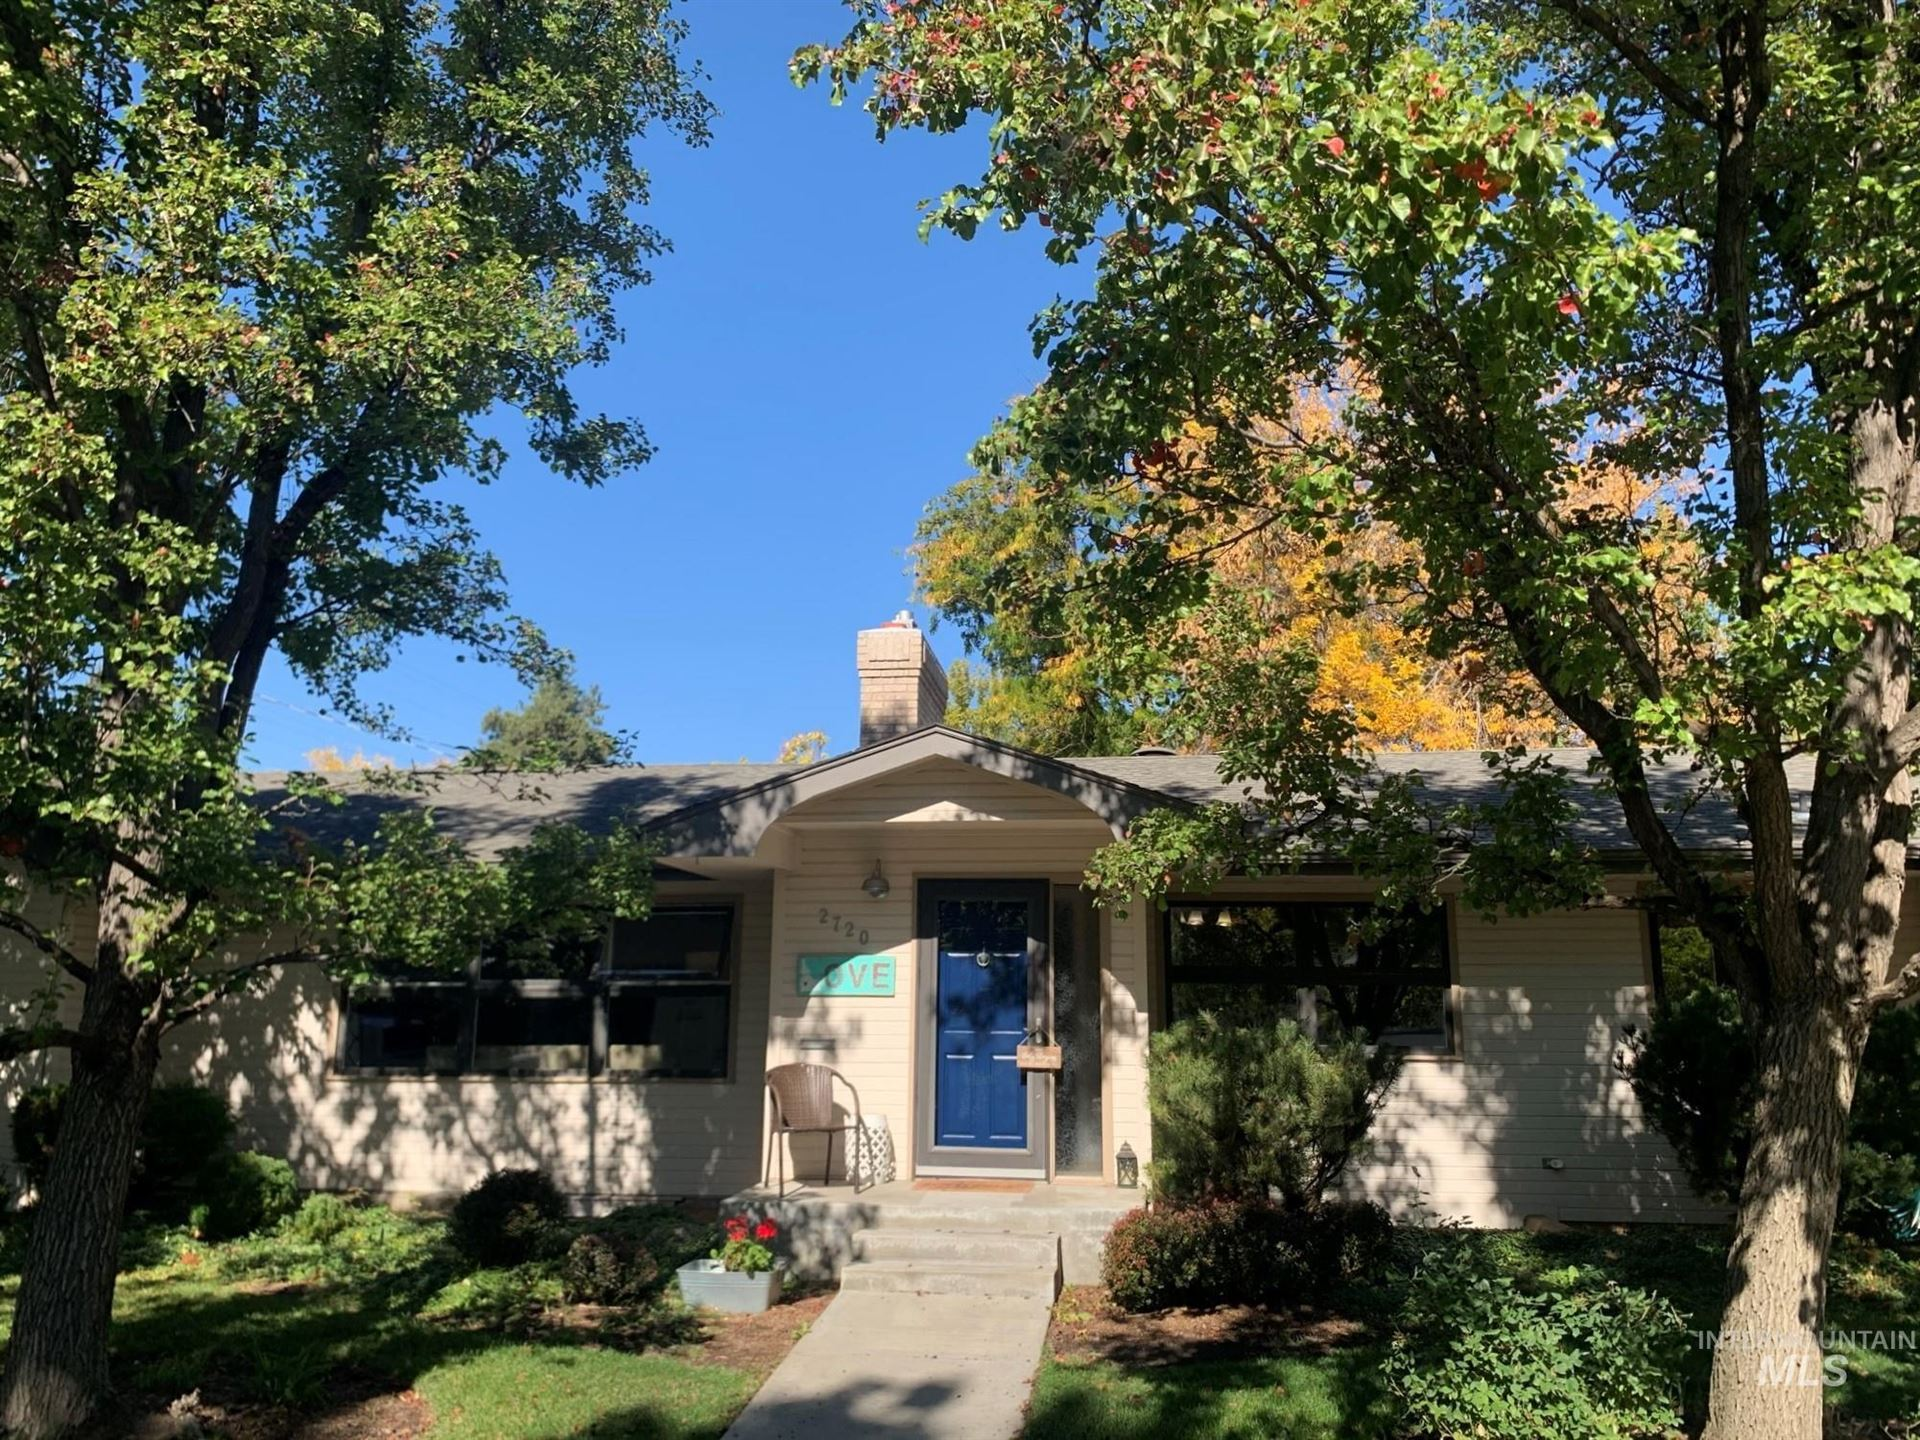 2720 W Teton, Boise, ID 83705 - MLS#: 98822033